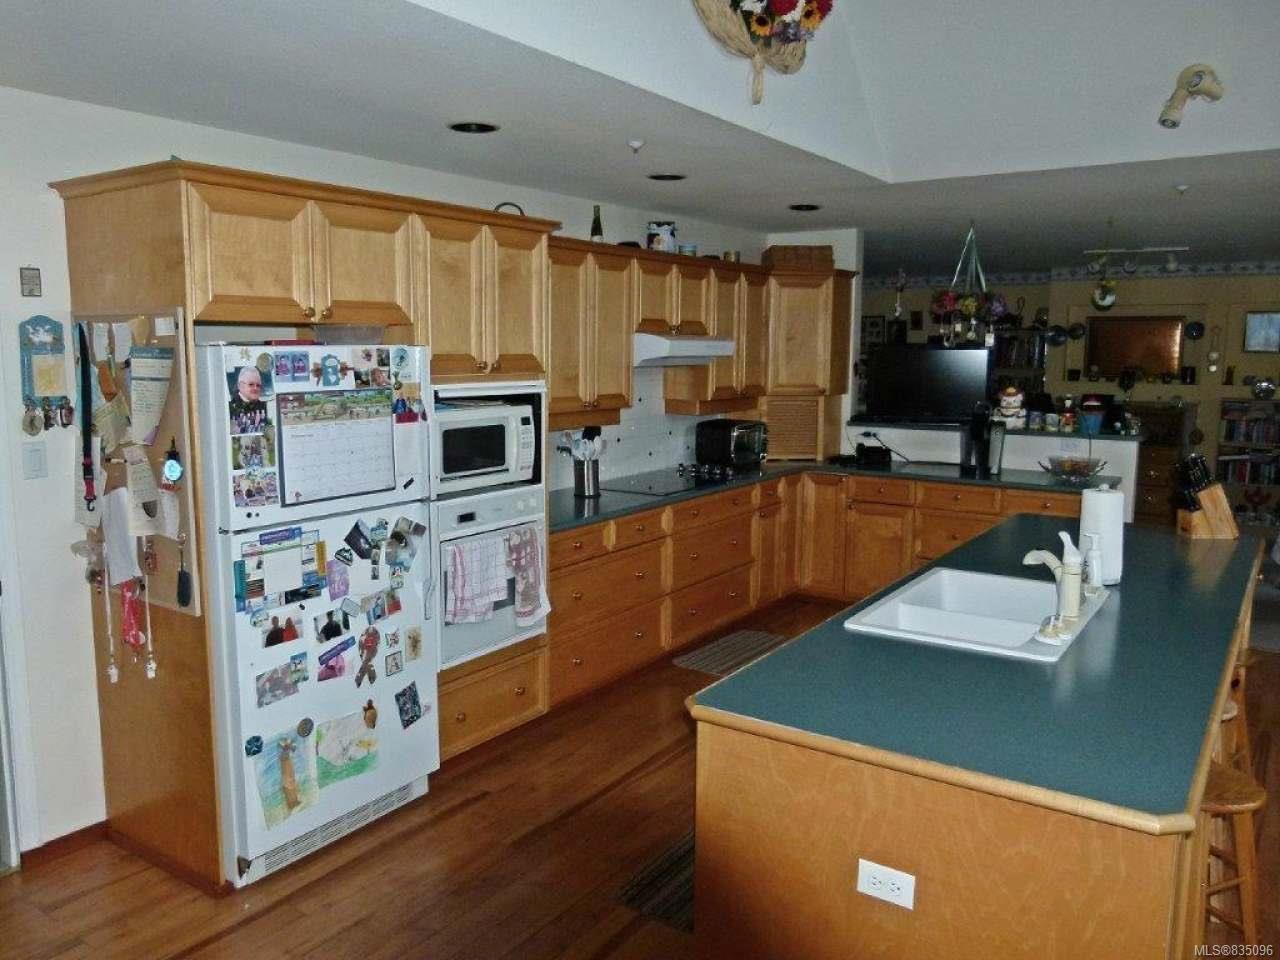 Photo 17: Photos: 2025 Bowen Rd in NANAIMO: Na Central Nanaimo Mixed Use for sale (Nanaimo)  : MLS®# 835096